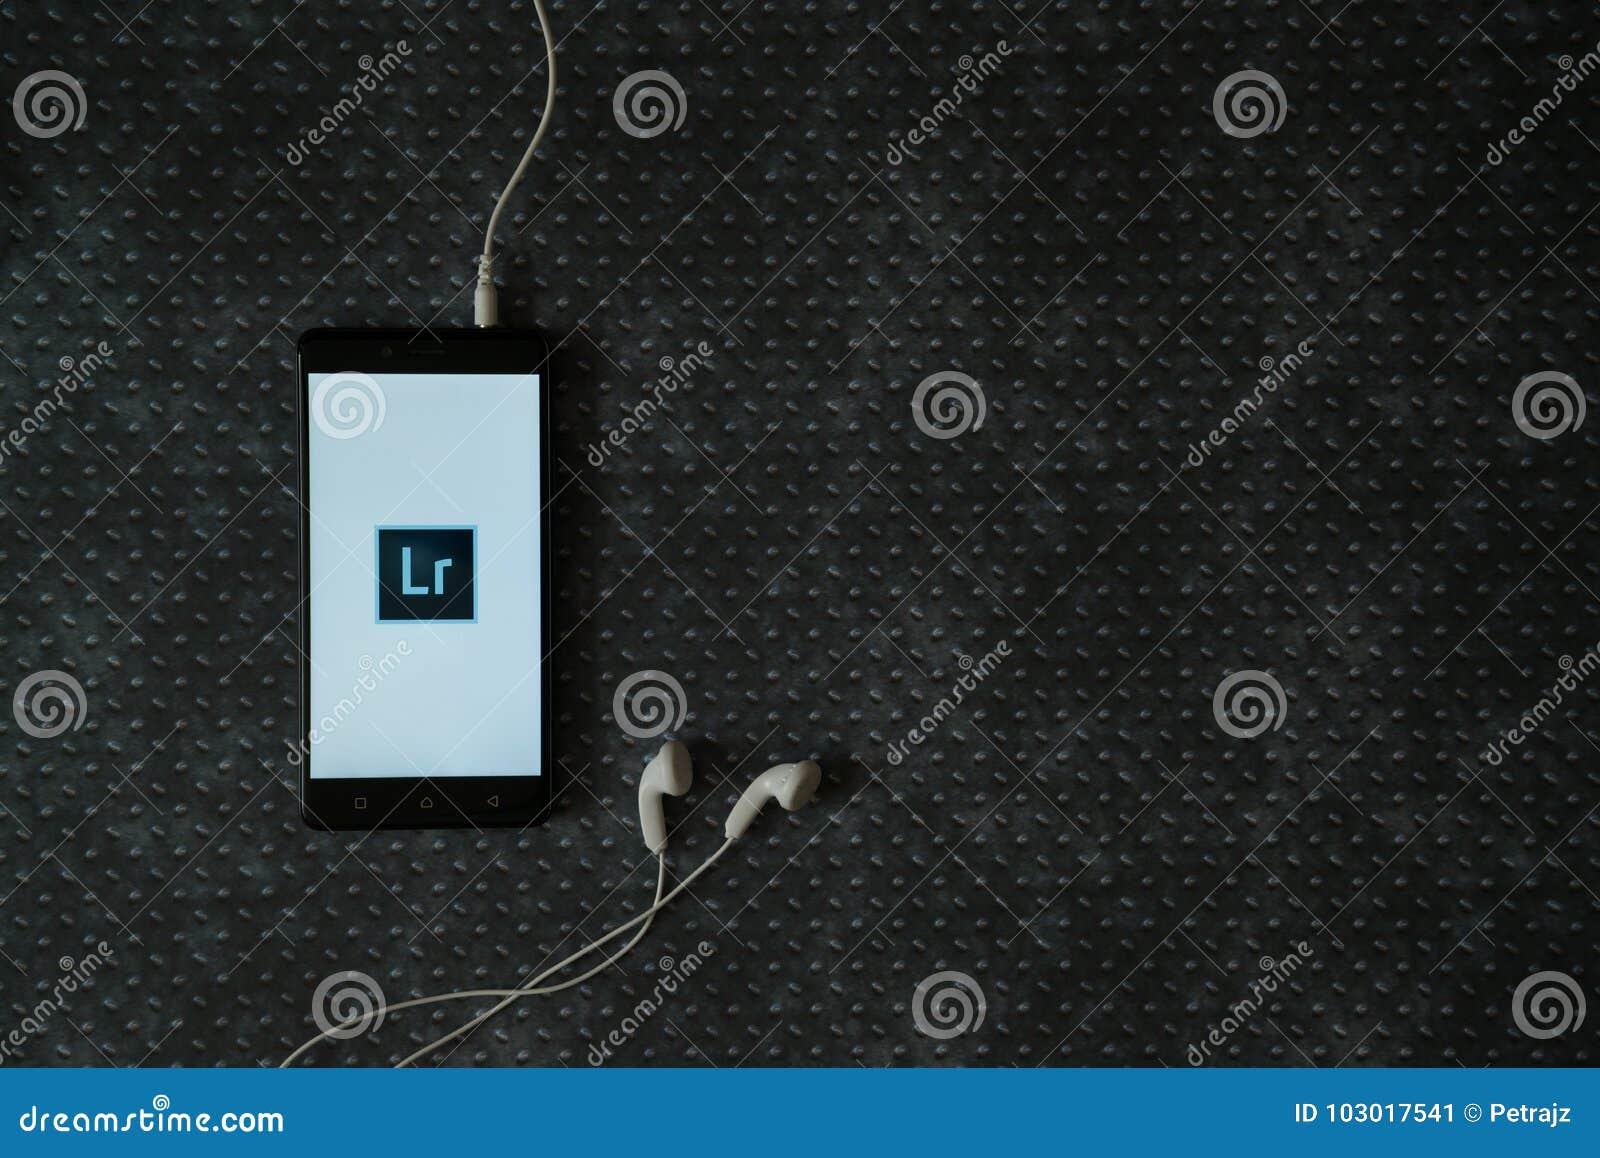 Adobe Photoshop Lightroom Logo On Smartphone Screen